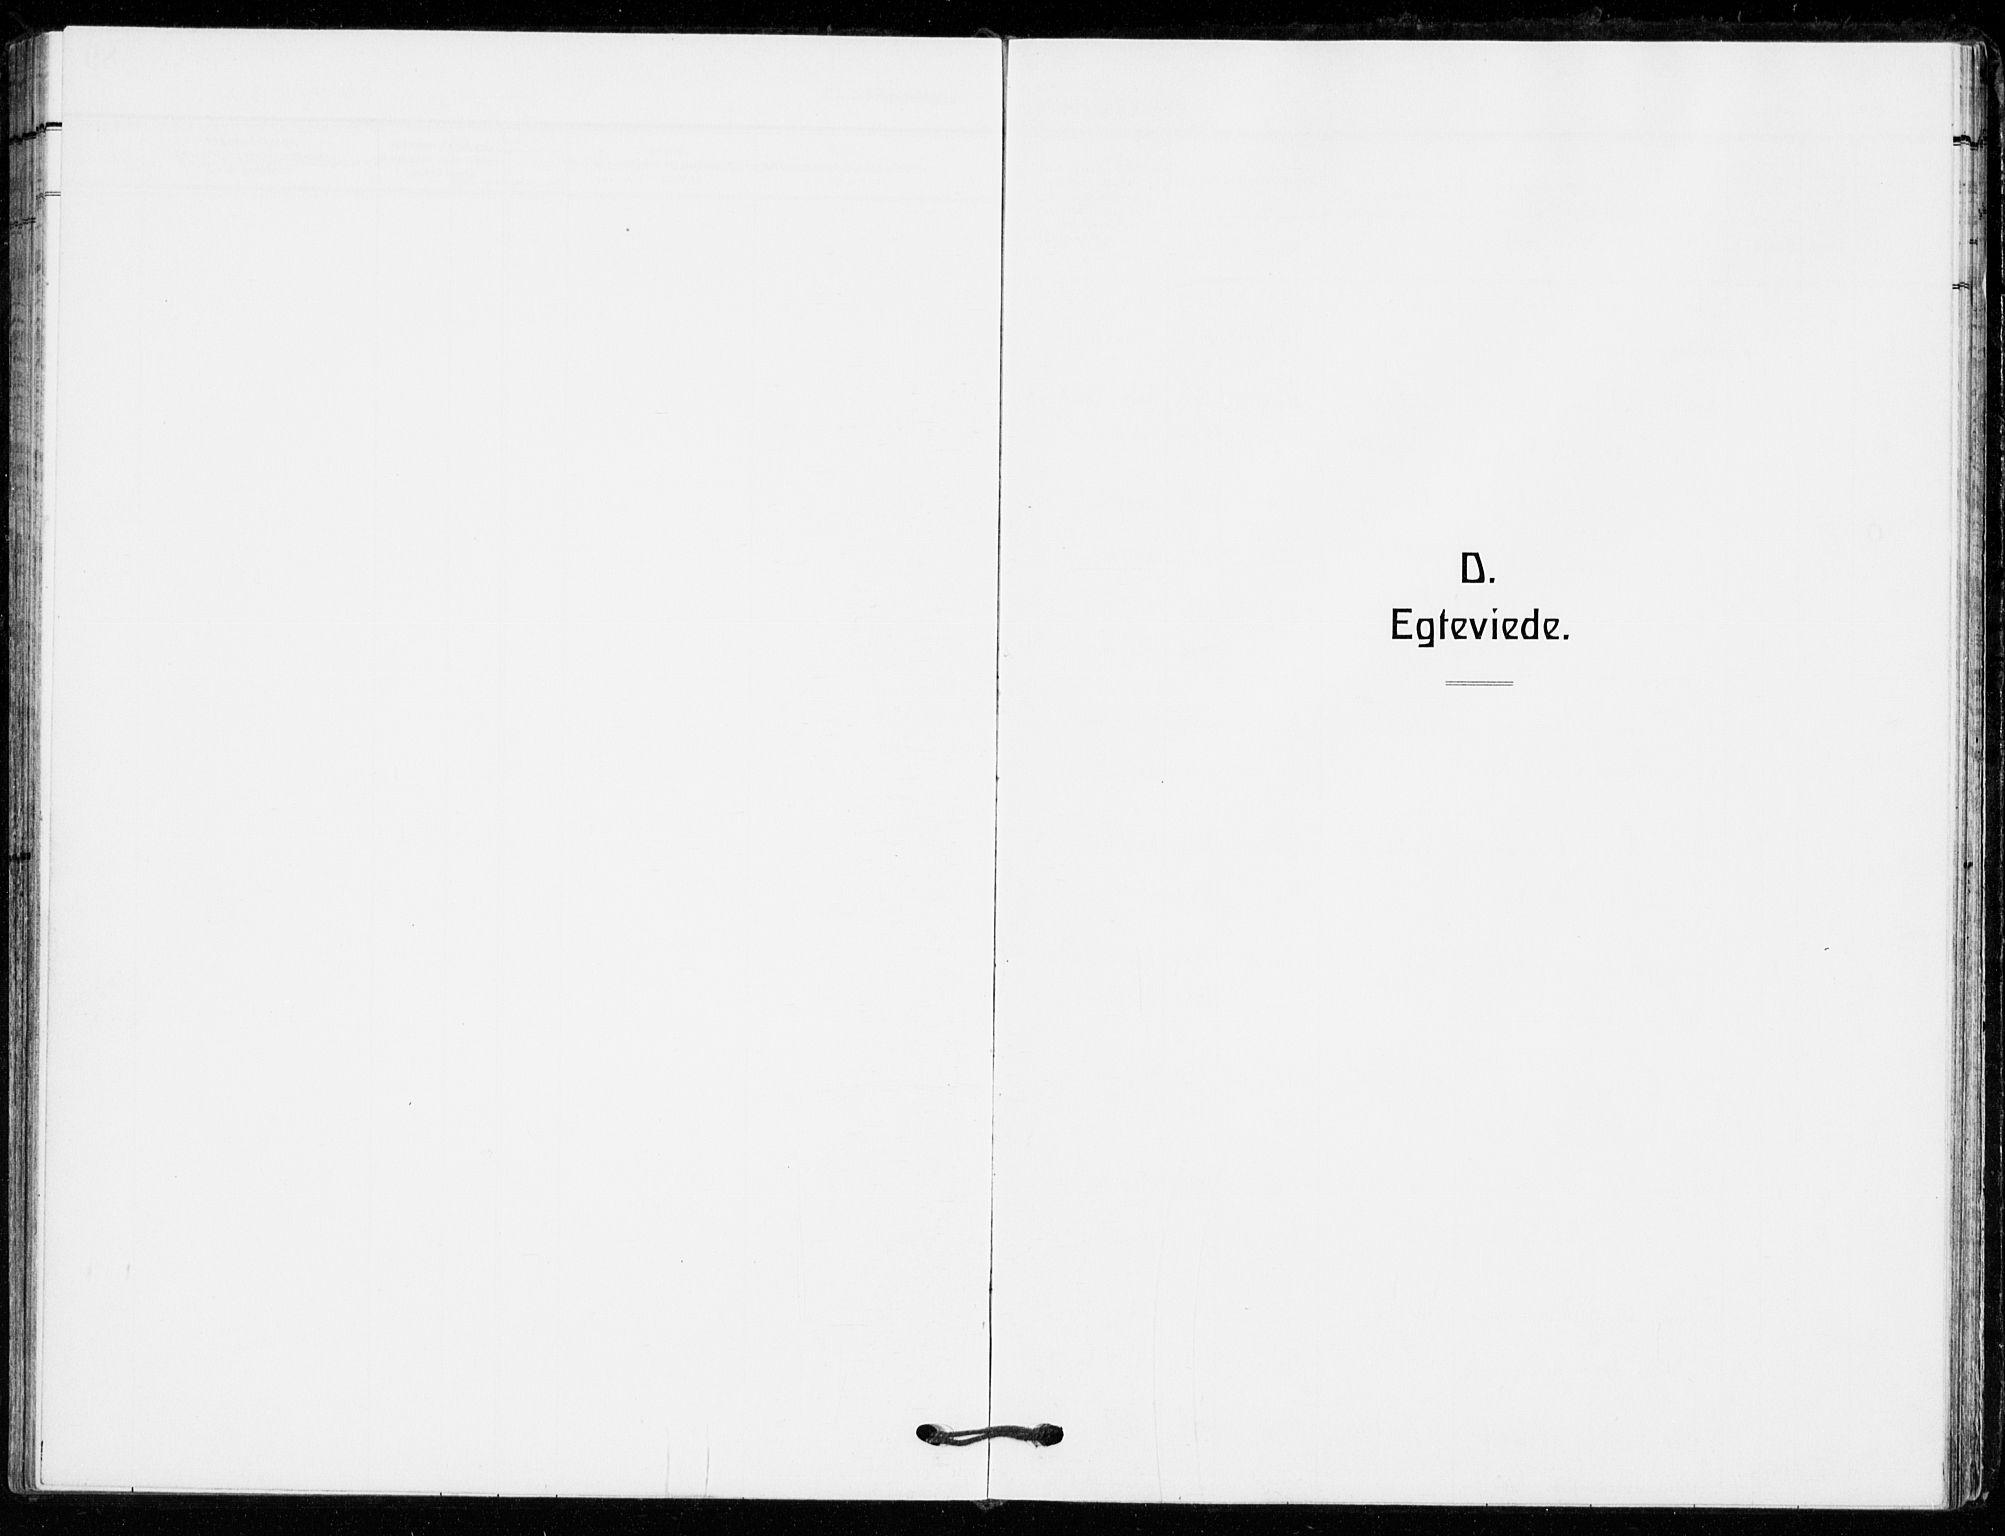 SAKO, Bø kirkebøker, F/Fa/L0013: Parish register (official) no. 13, 1909-1921